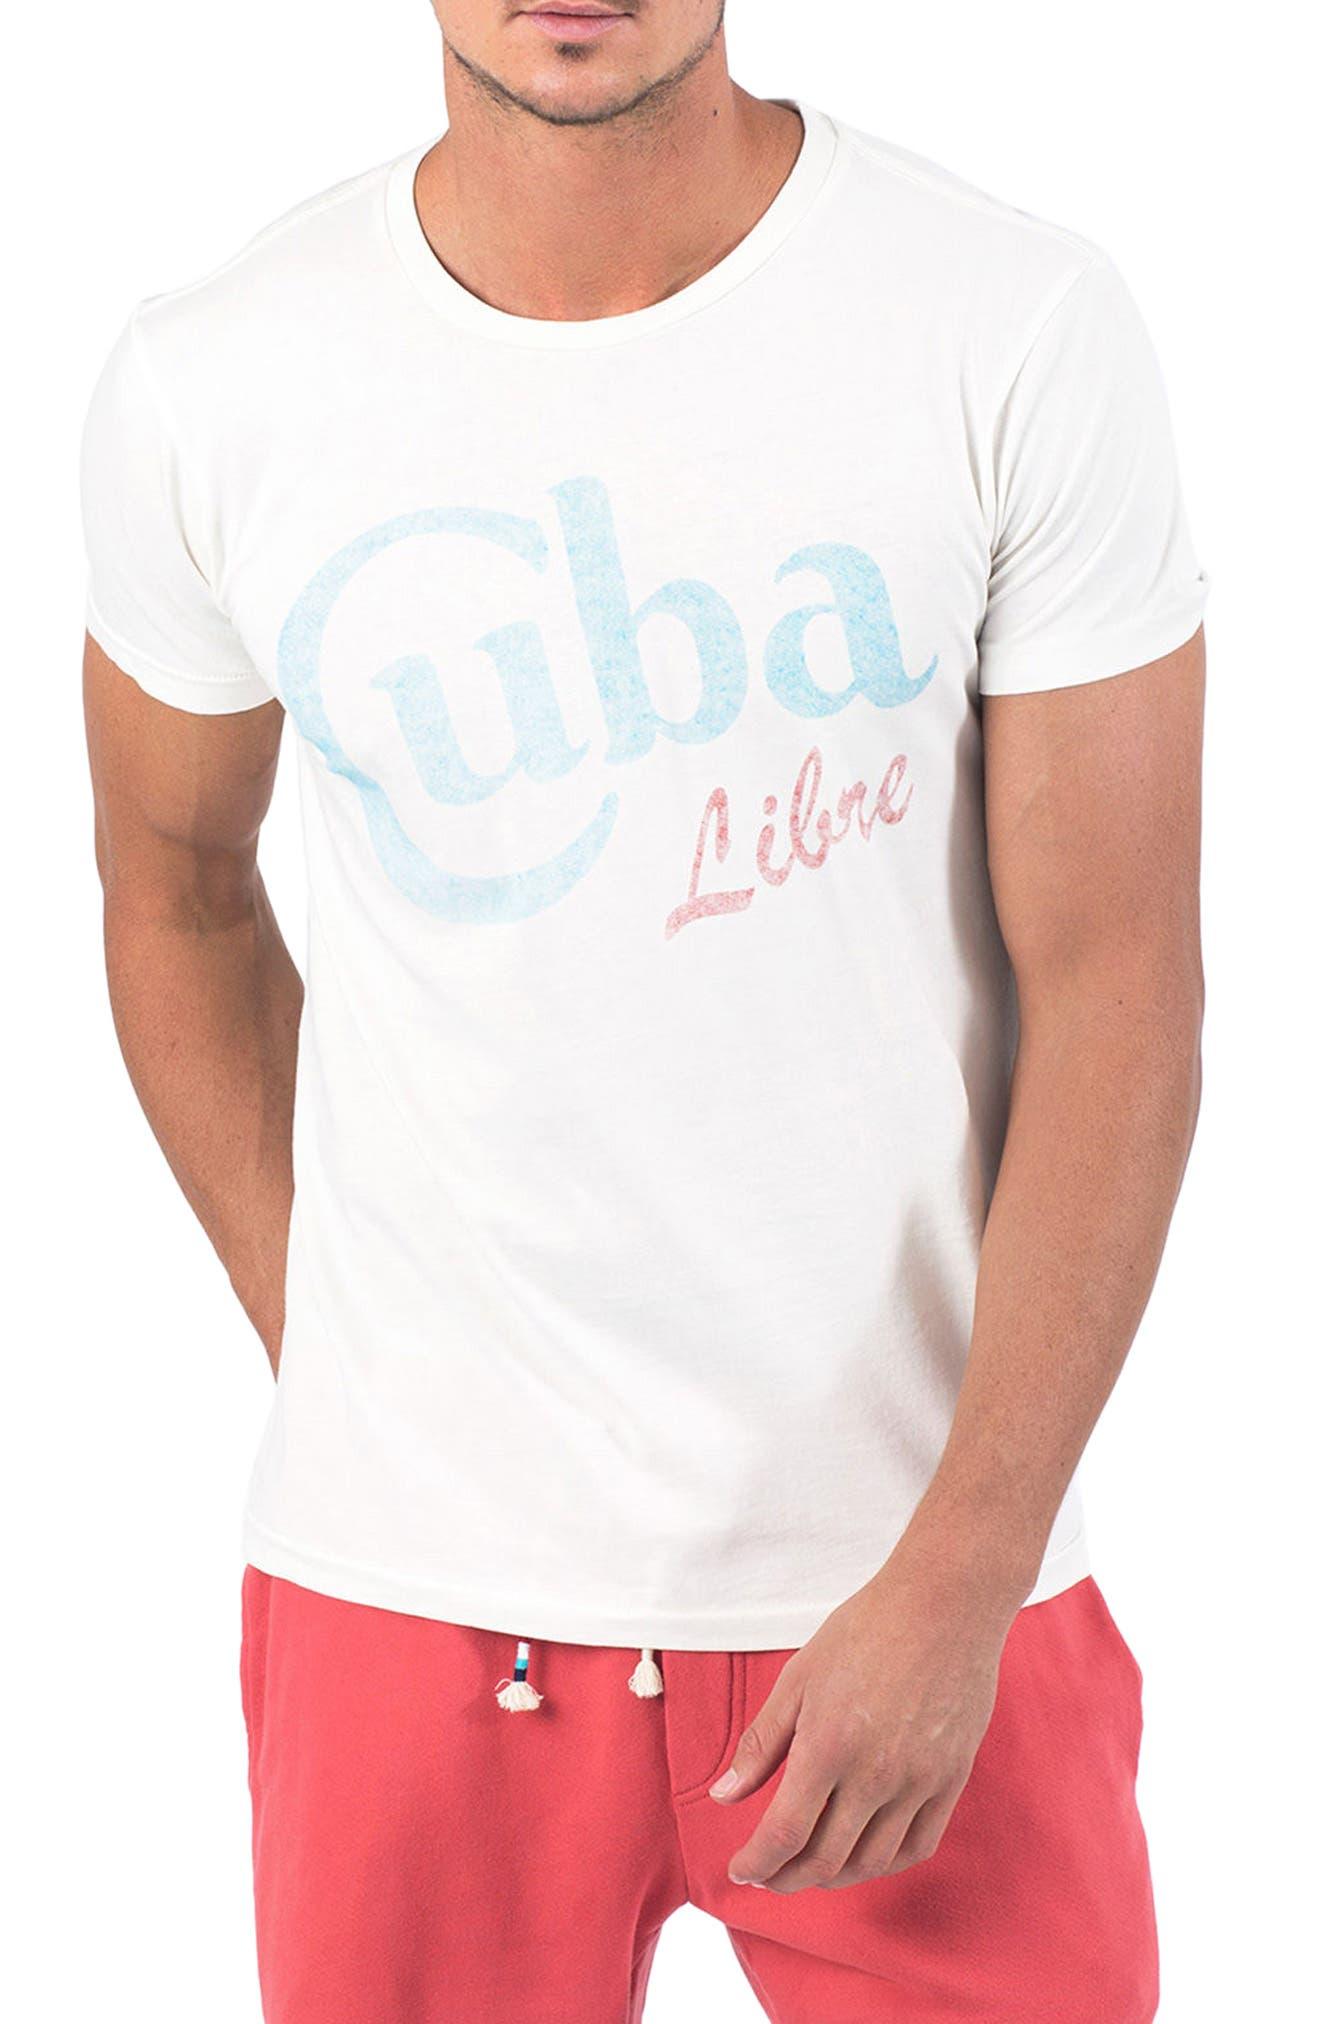 Alternate Image 1 Selected - Sol Angeles Cuba Libre T-Shirt